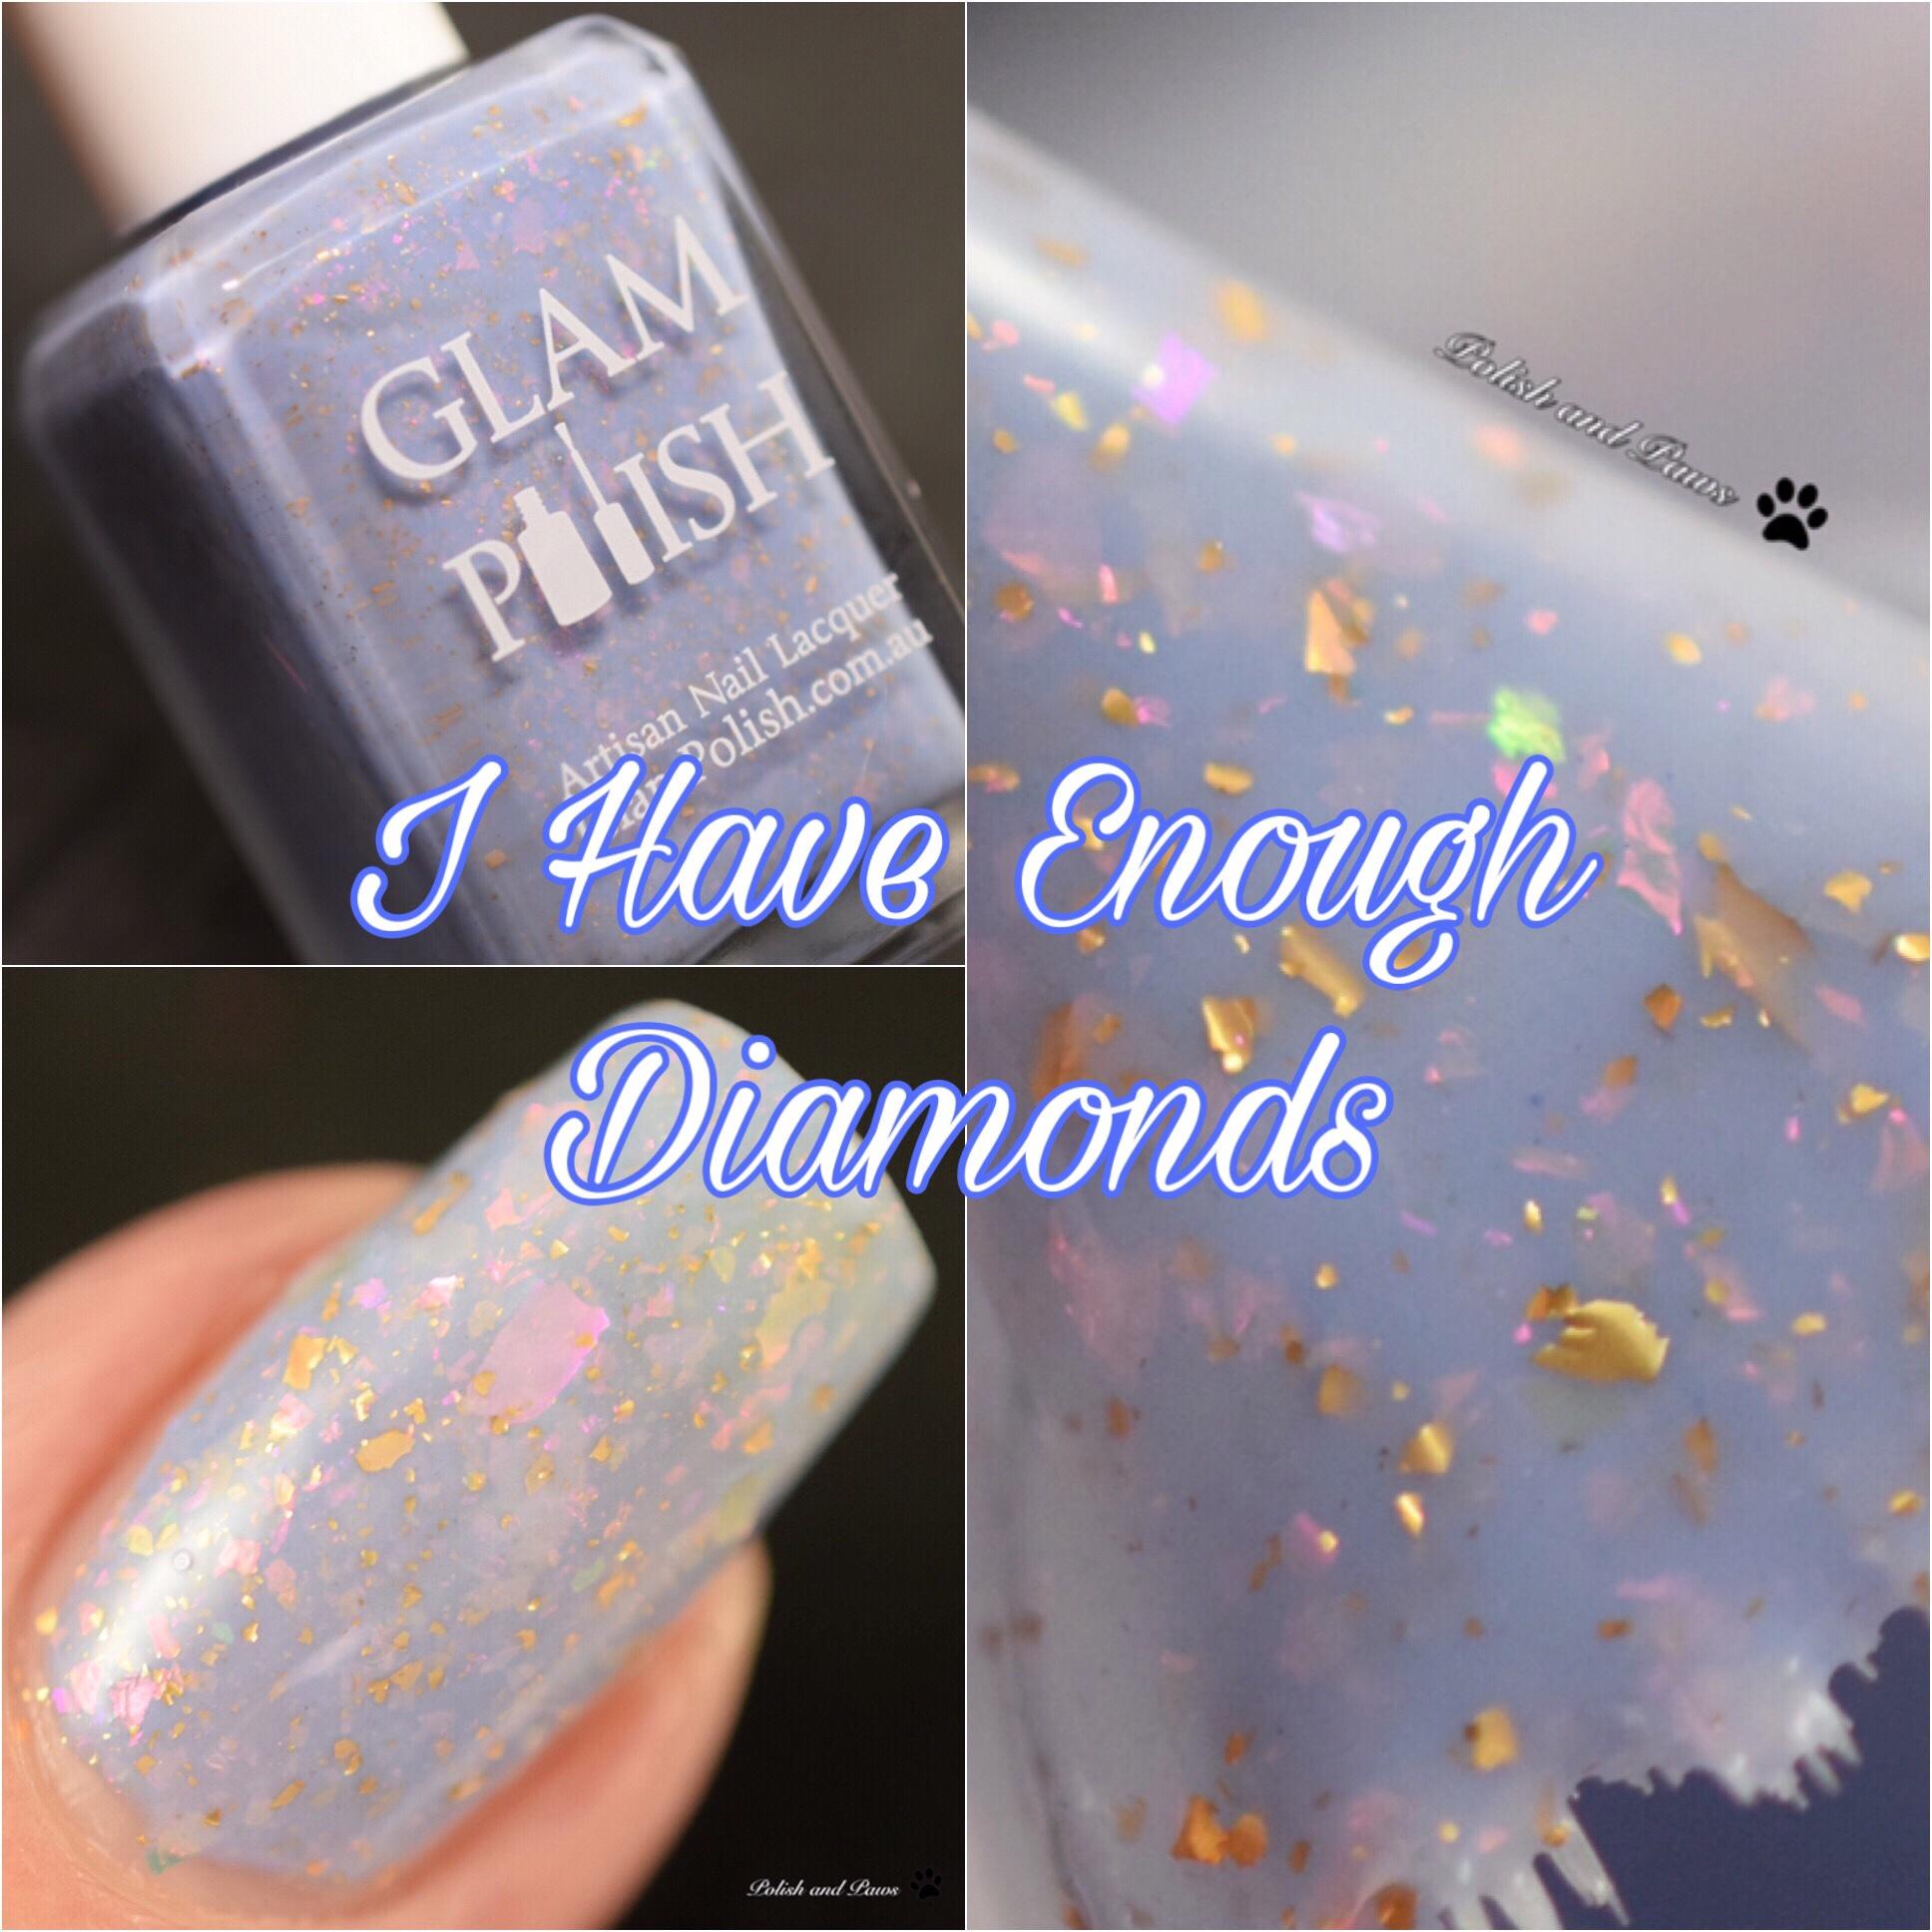 Glam Polish I Have Enough Diamonds